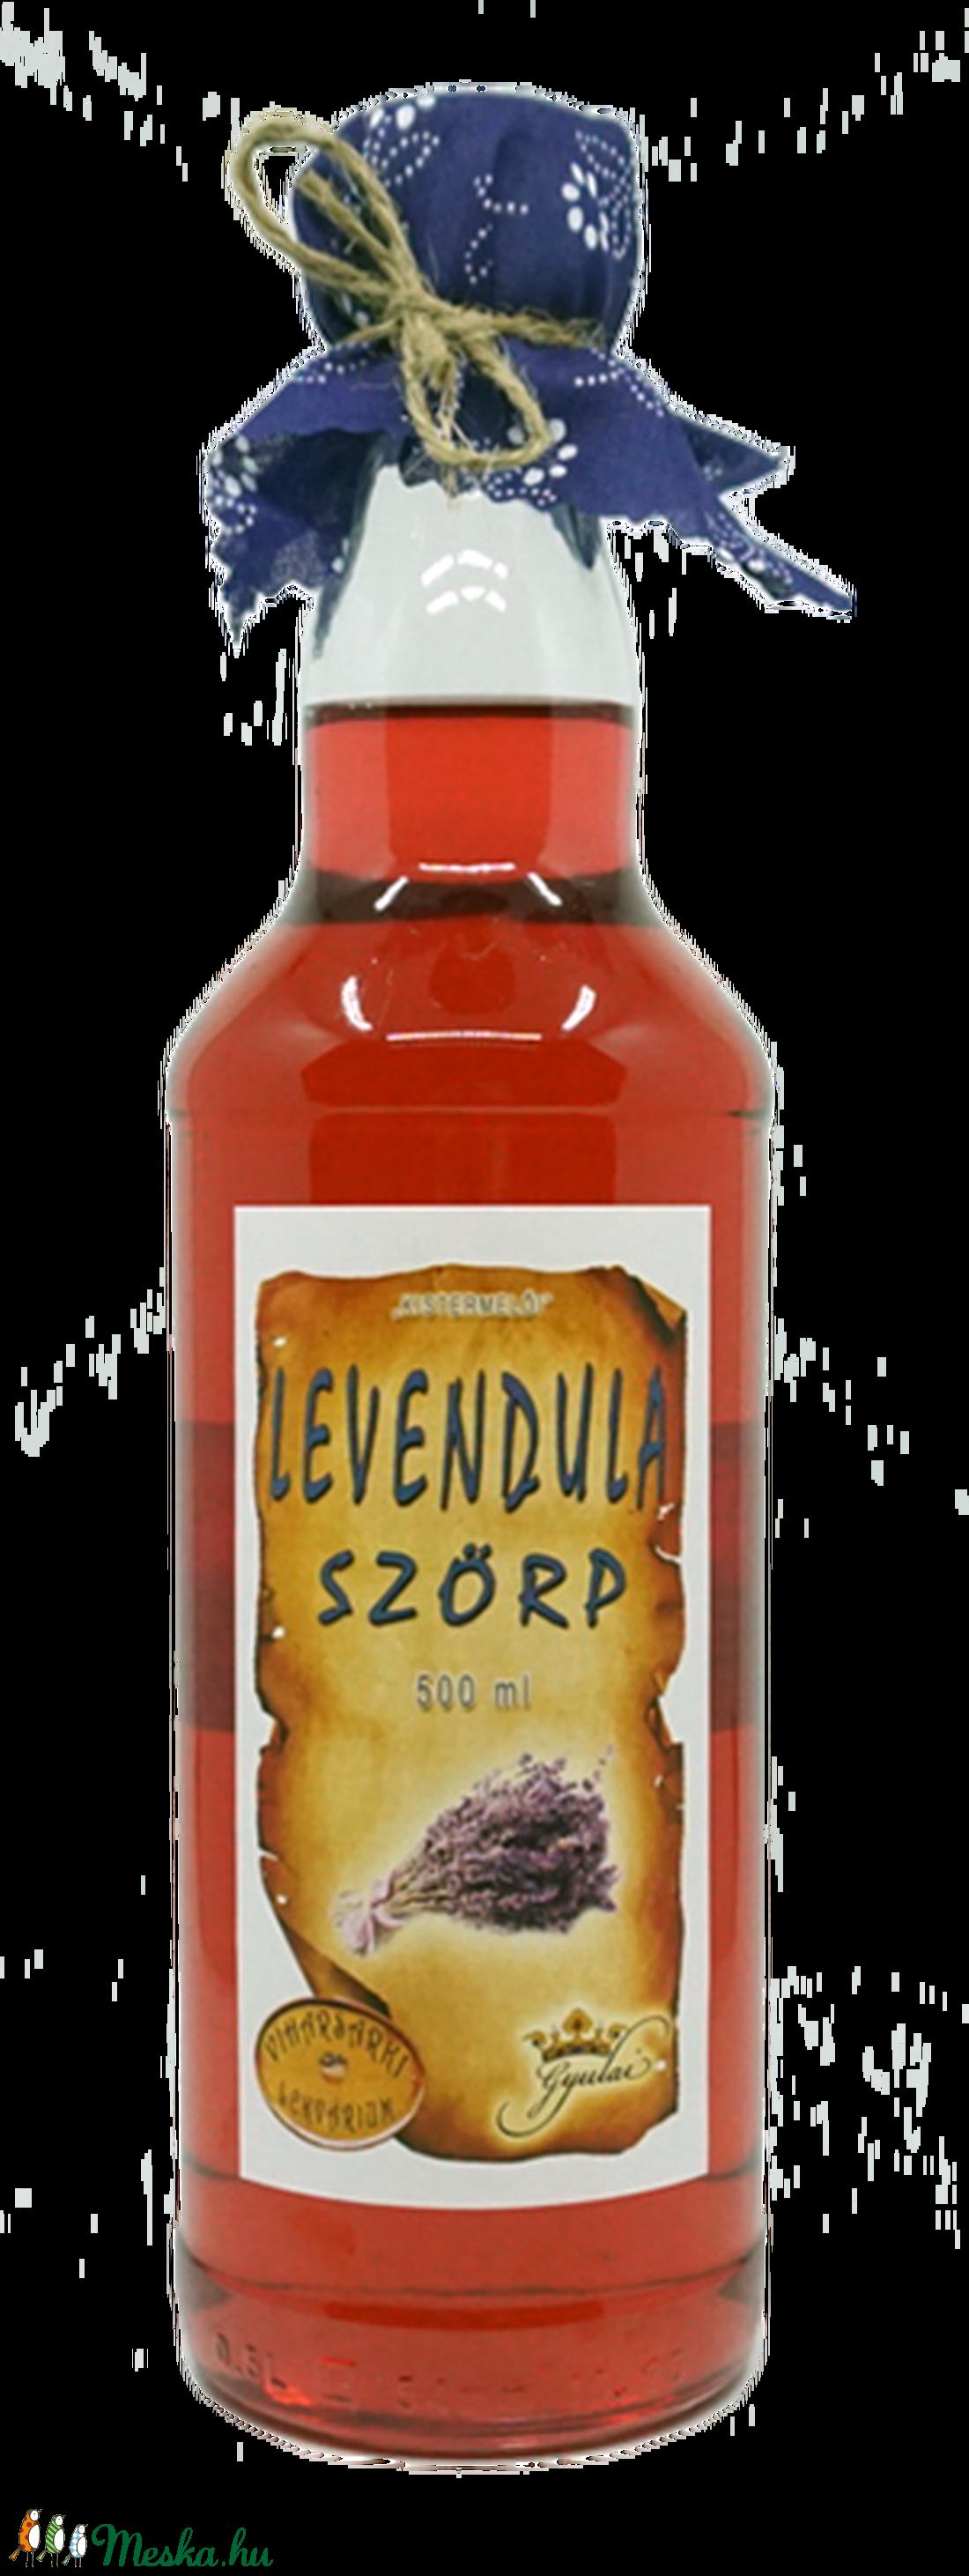 Levendulavirág szörp (500 ml) (viharsarkilekvariu) - Meska.hu